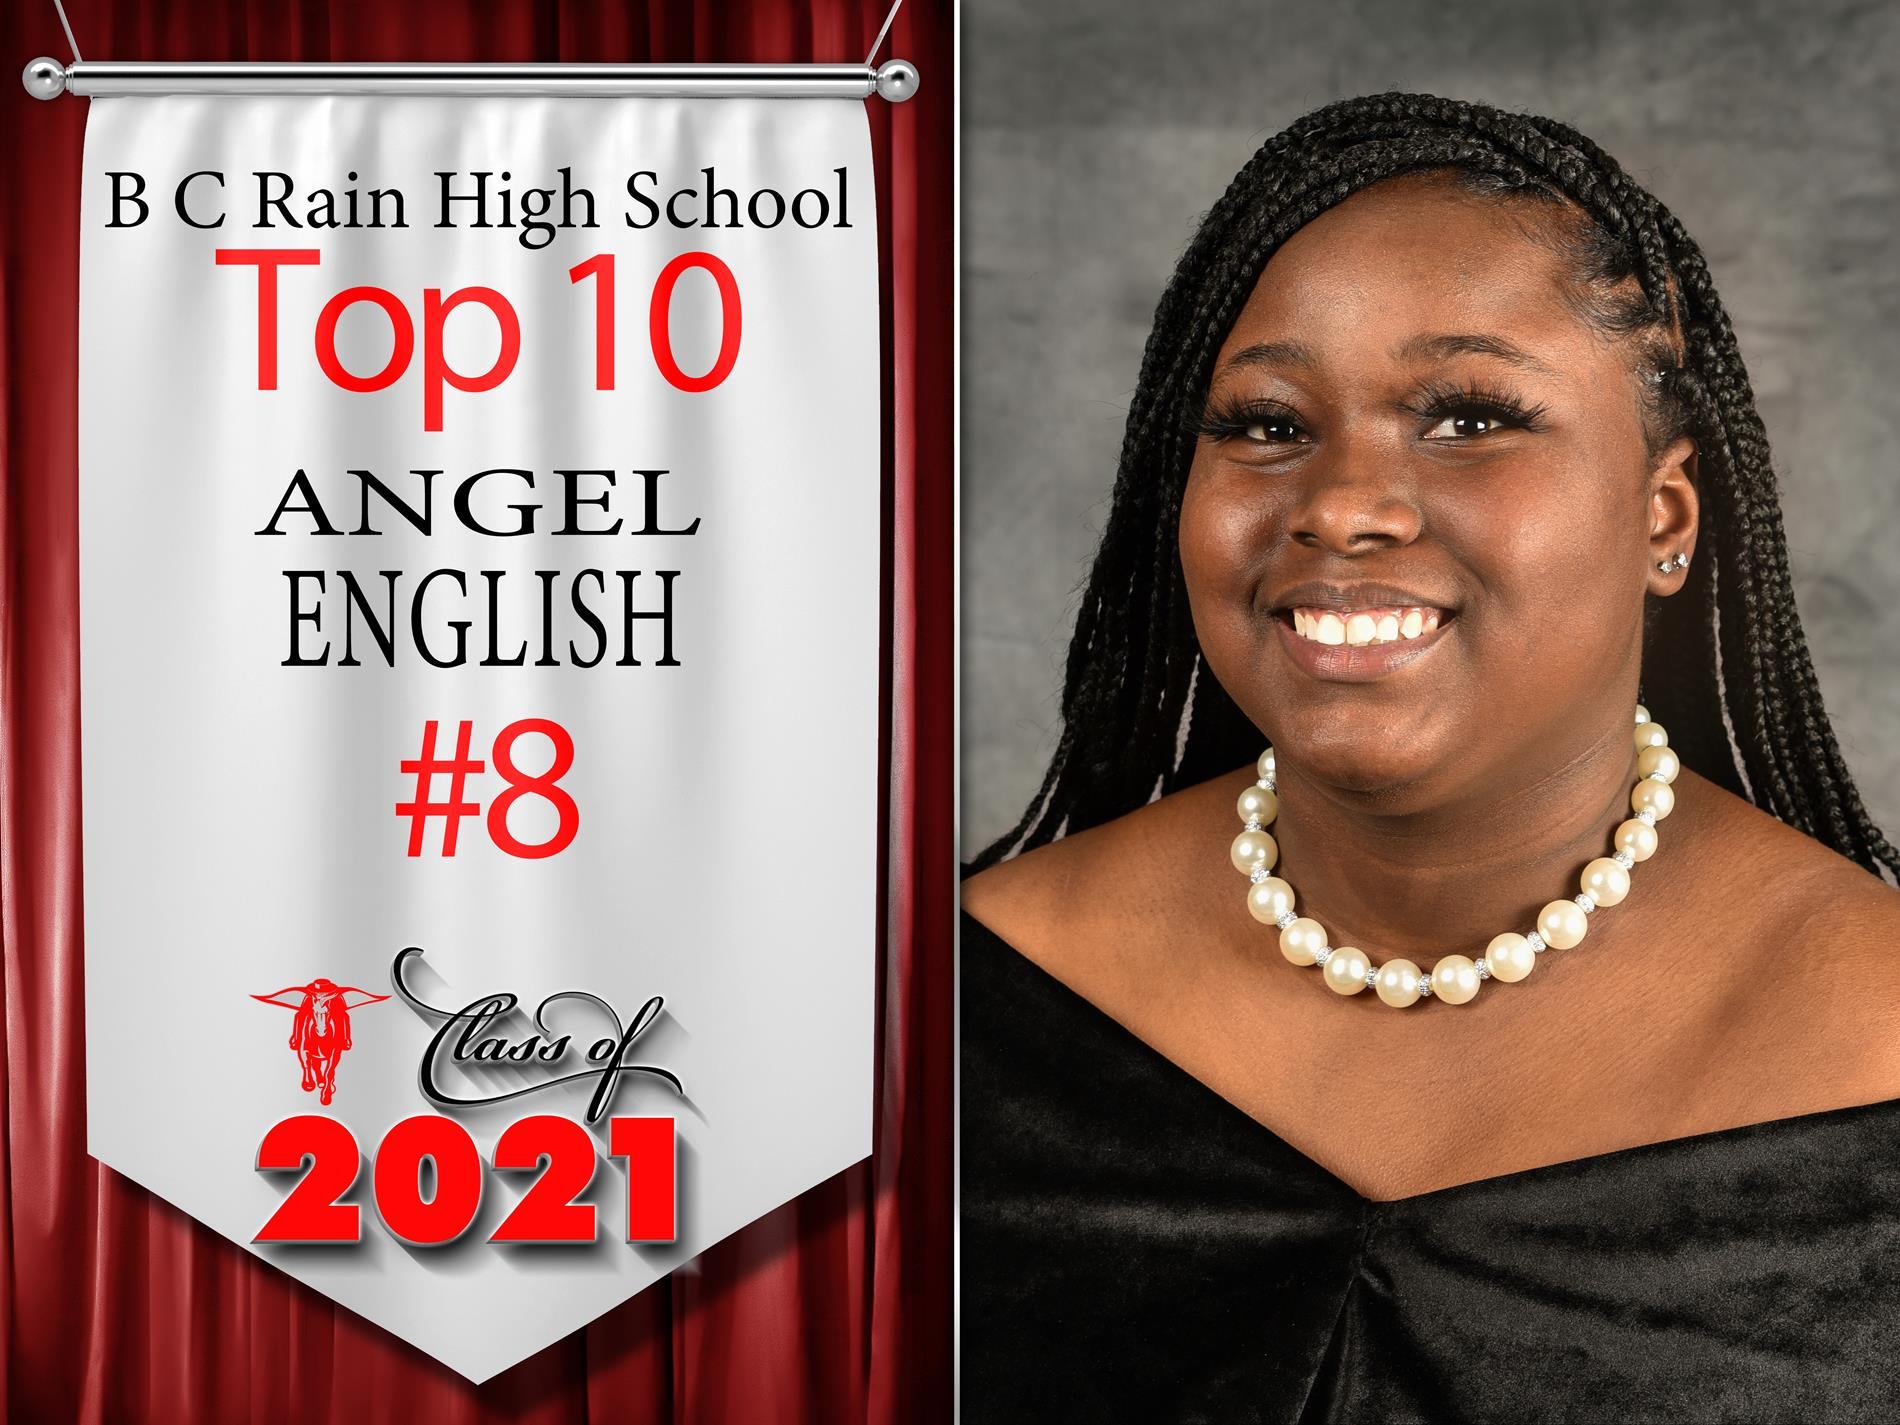 B.C. Rain's Class of 2021 Top 10 Seniors